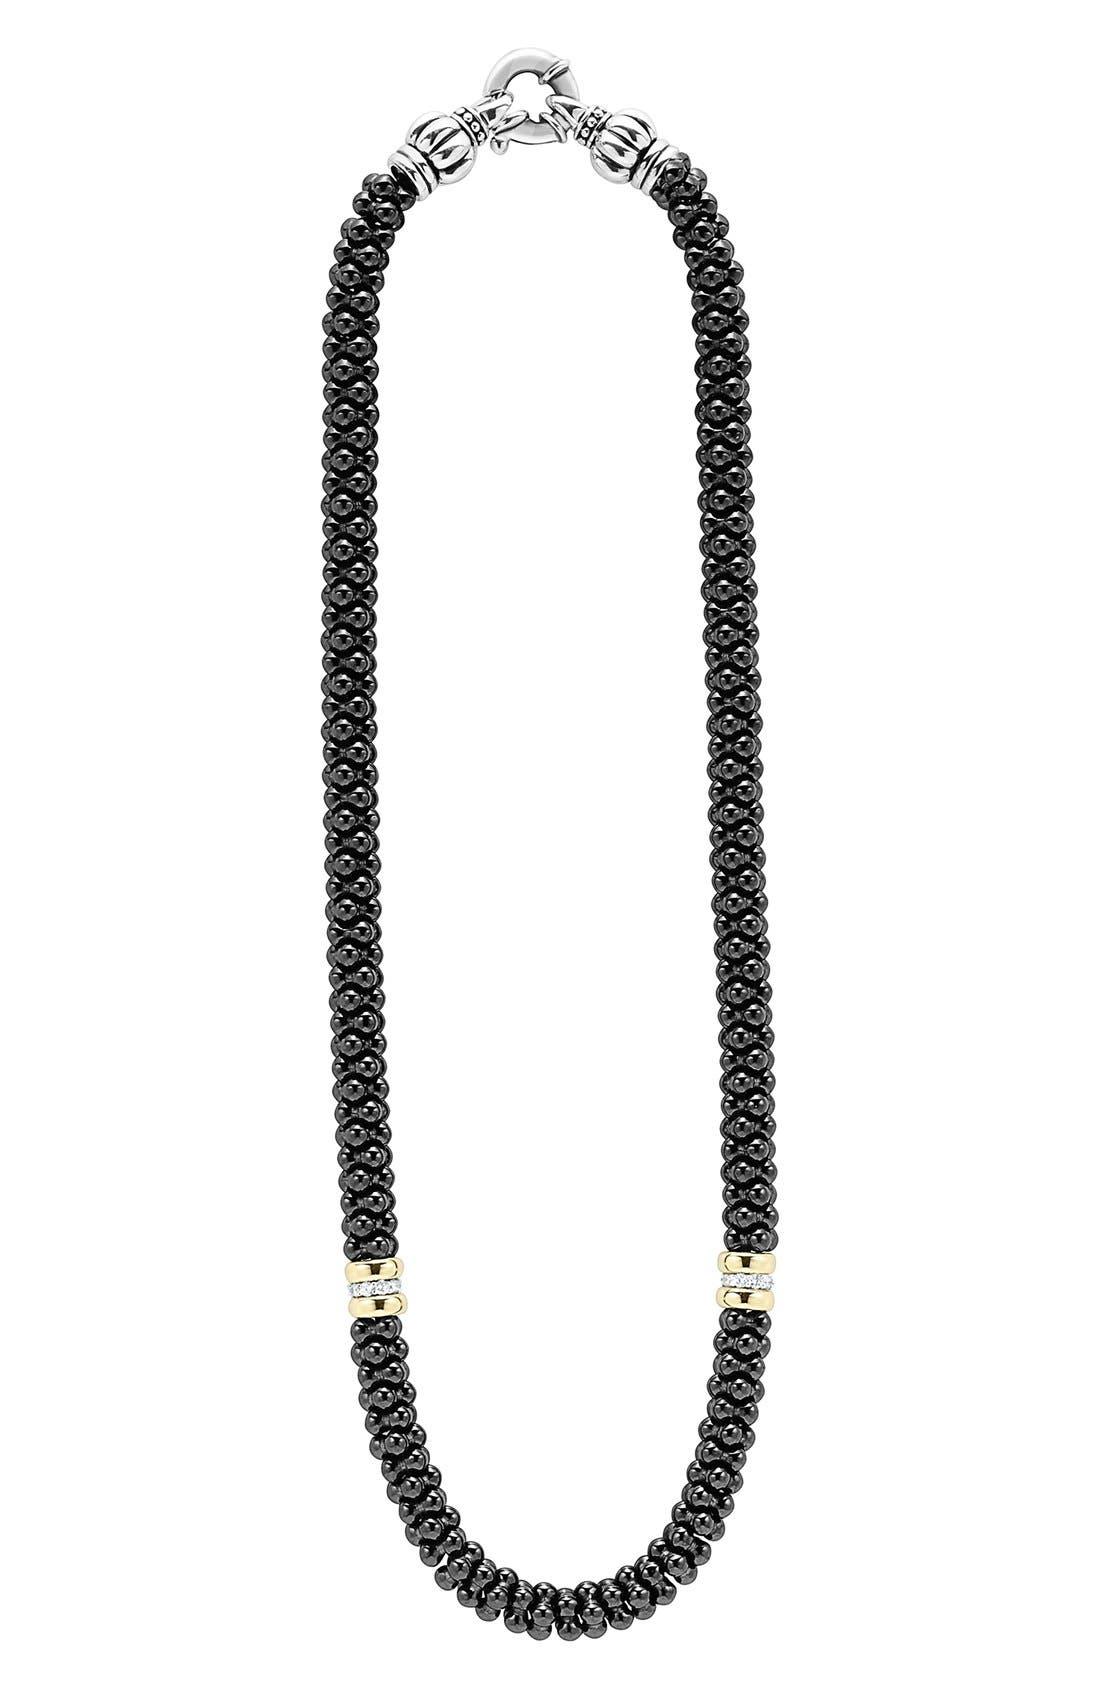 'Black Caviar' 7mm Beaded Diamond Station Necklace,                             Main thumbnail 1, color,                             BLACK CAVIAR/ GOLD